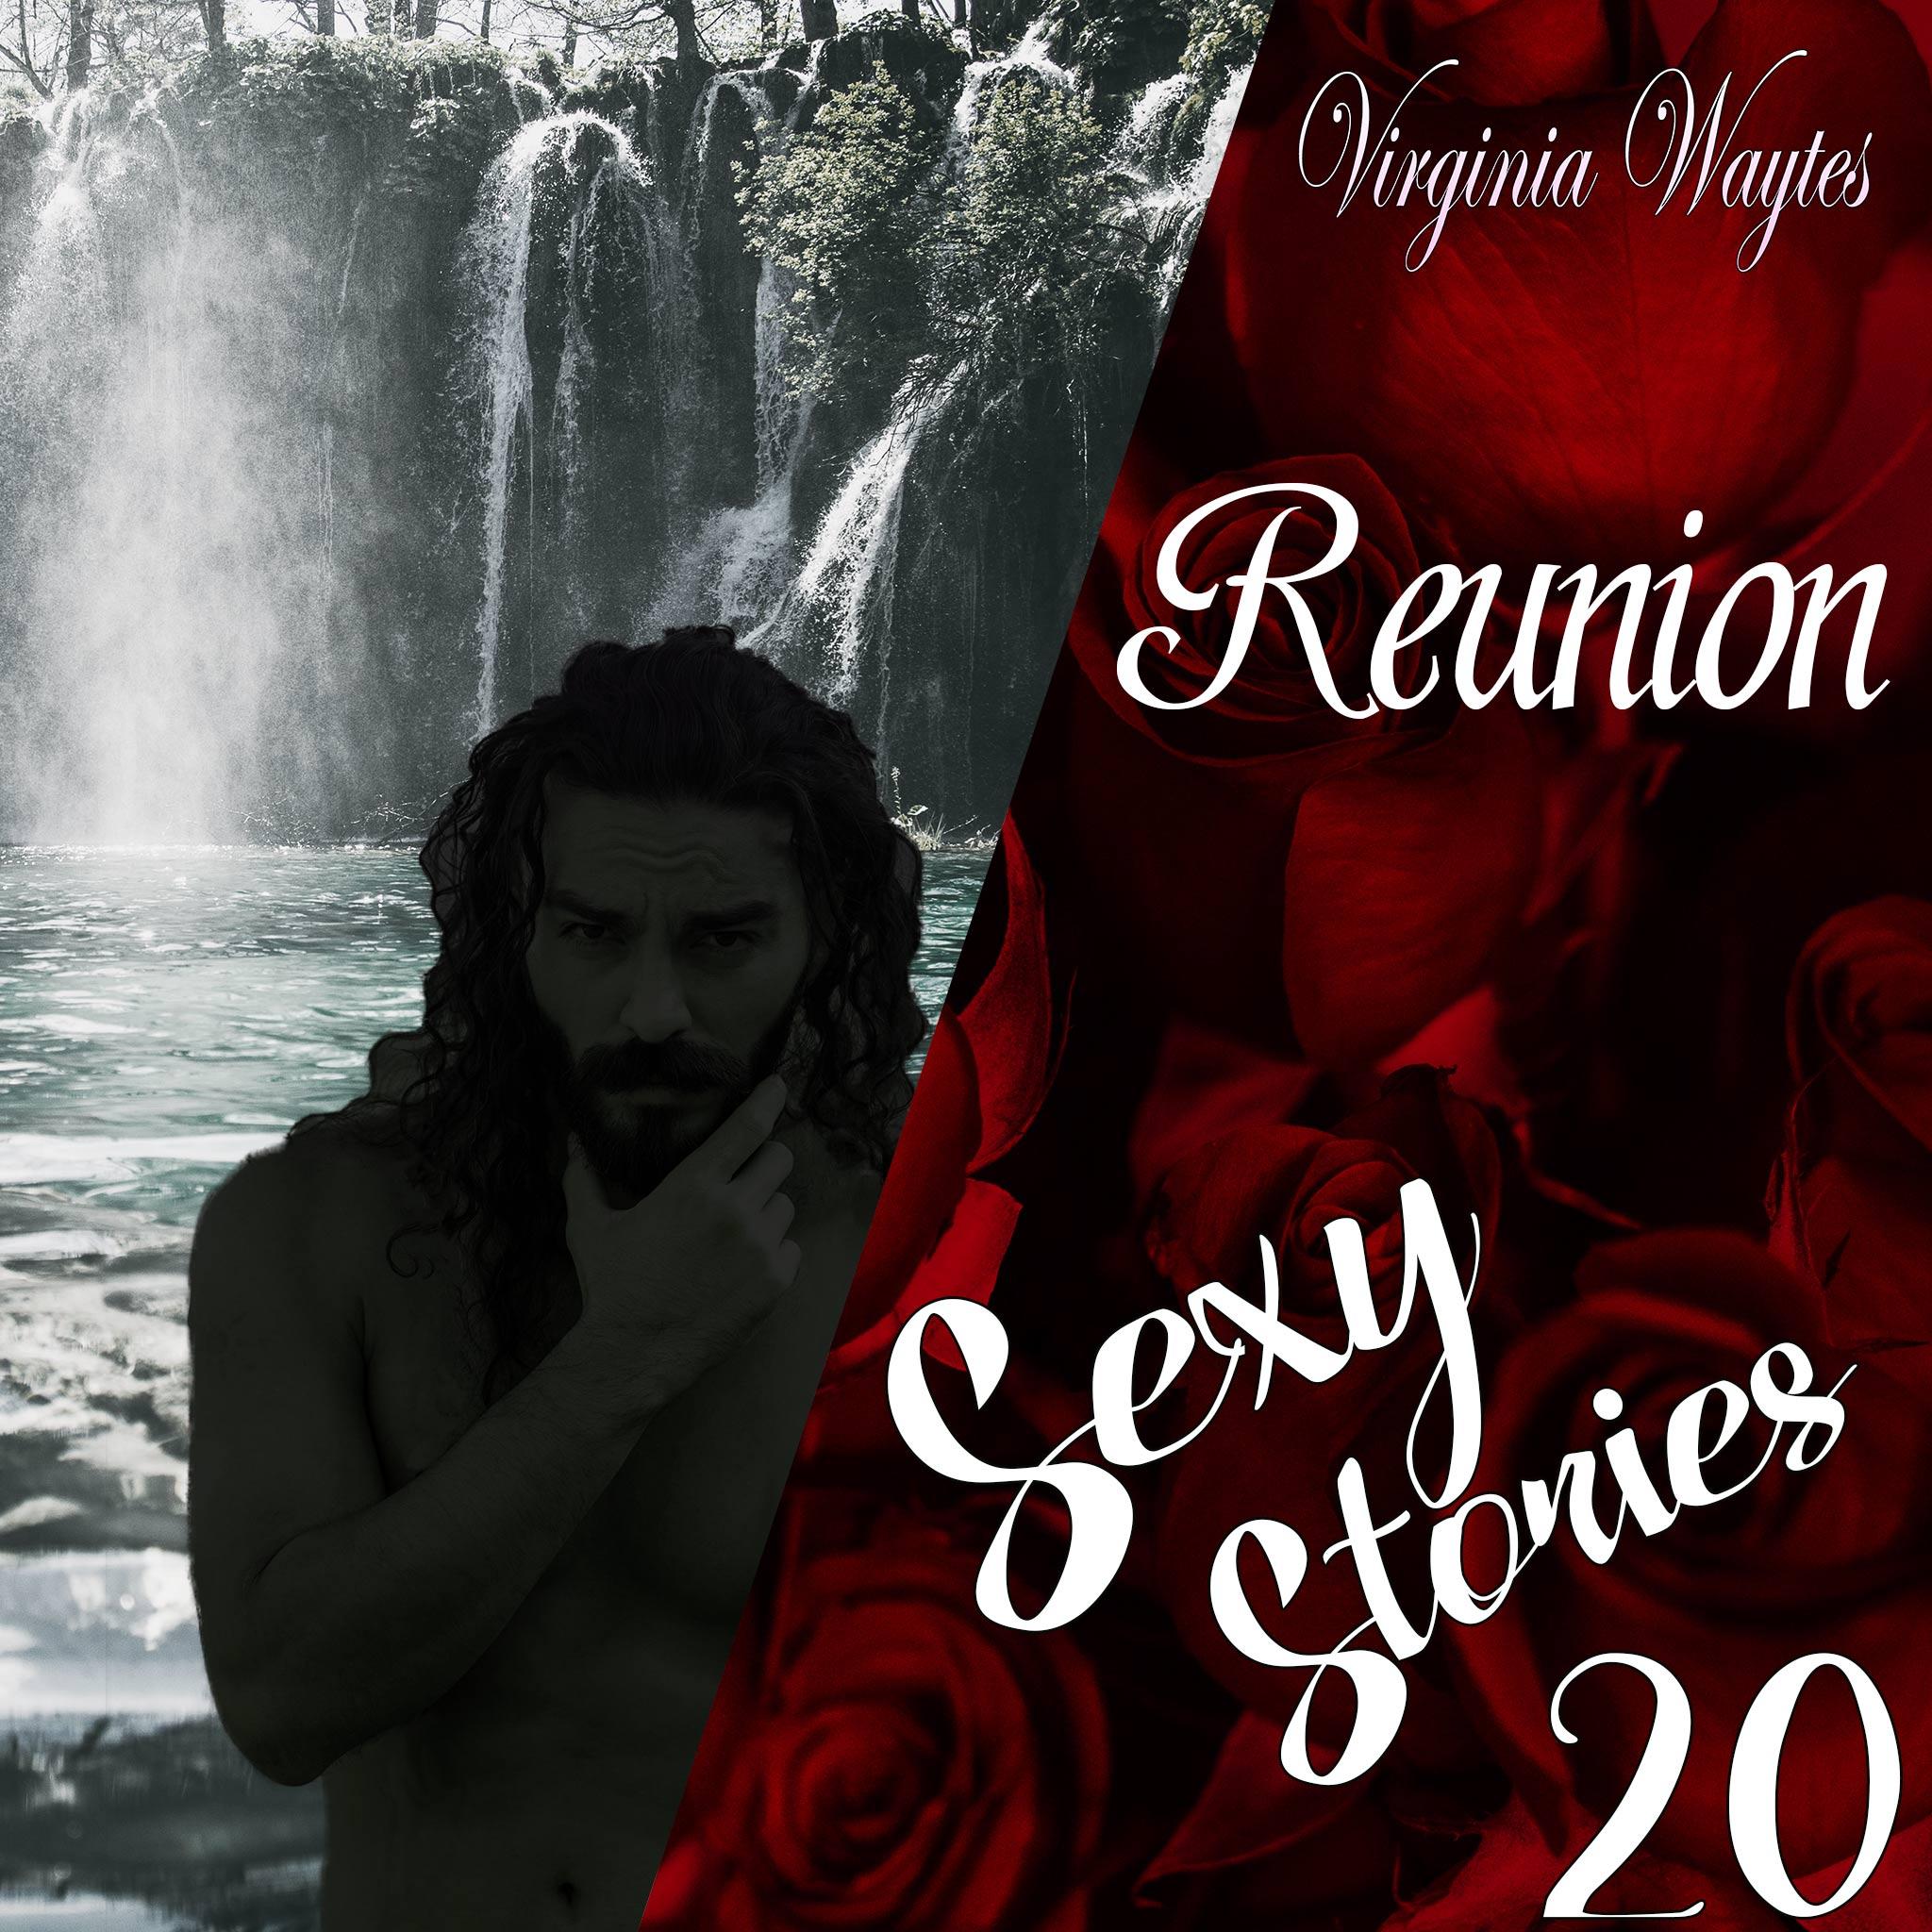 Sexy Stories 18 - Transcript